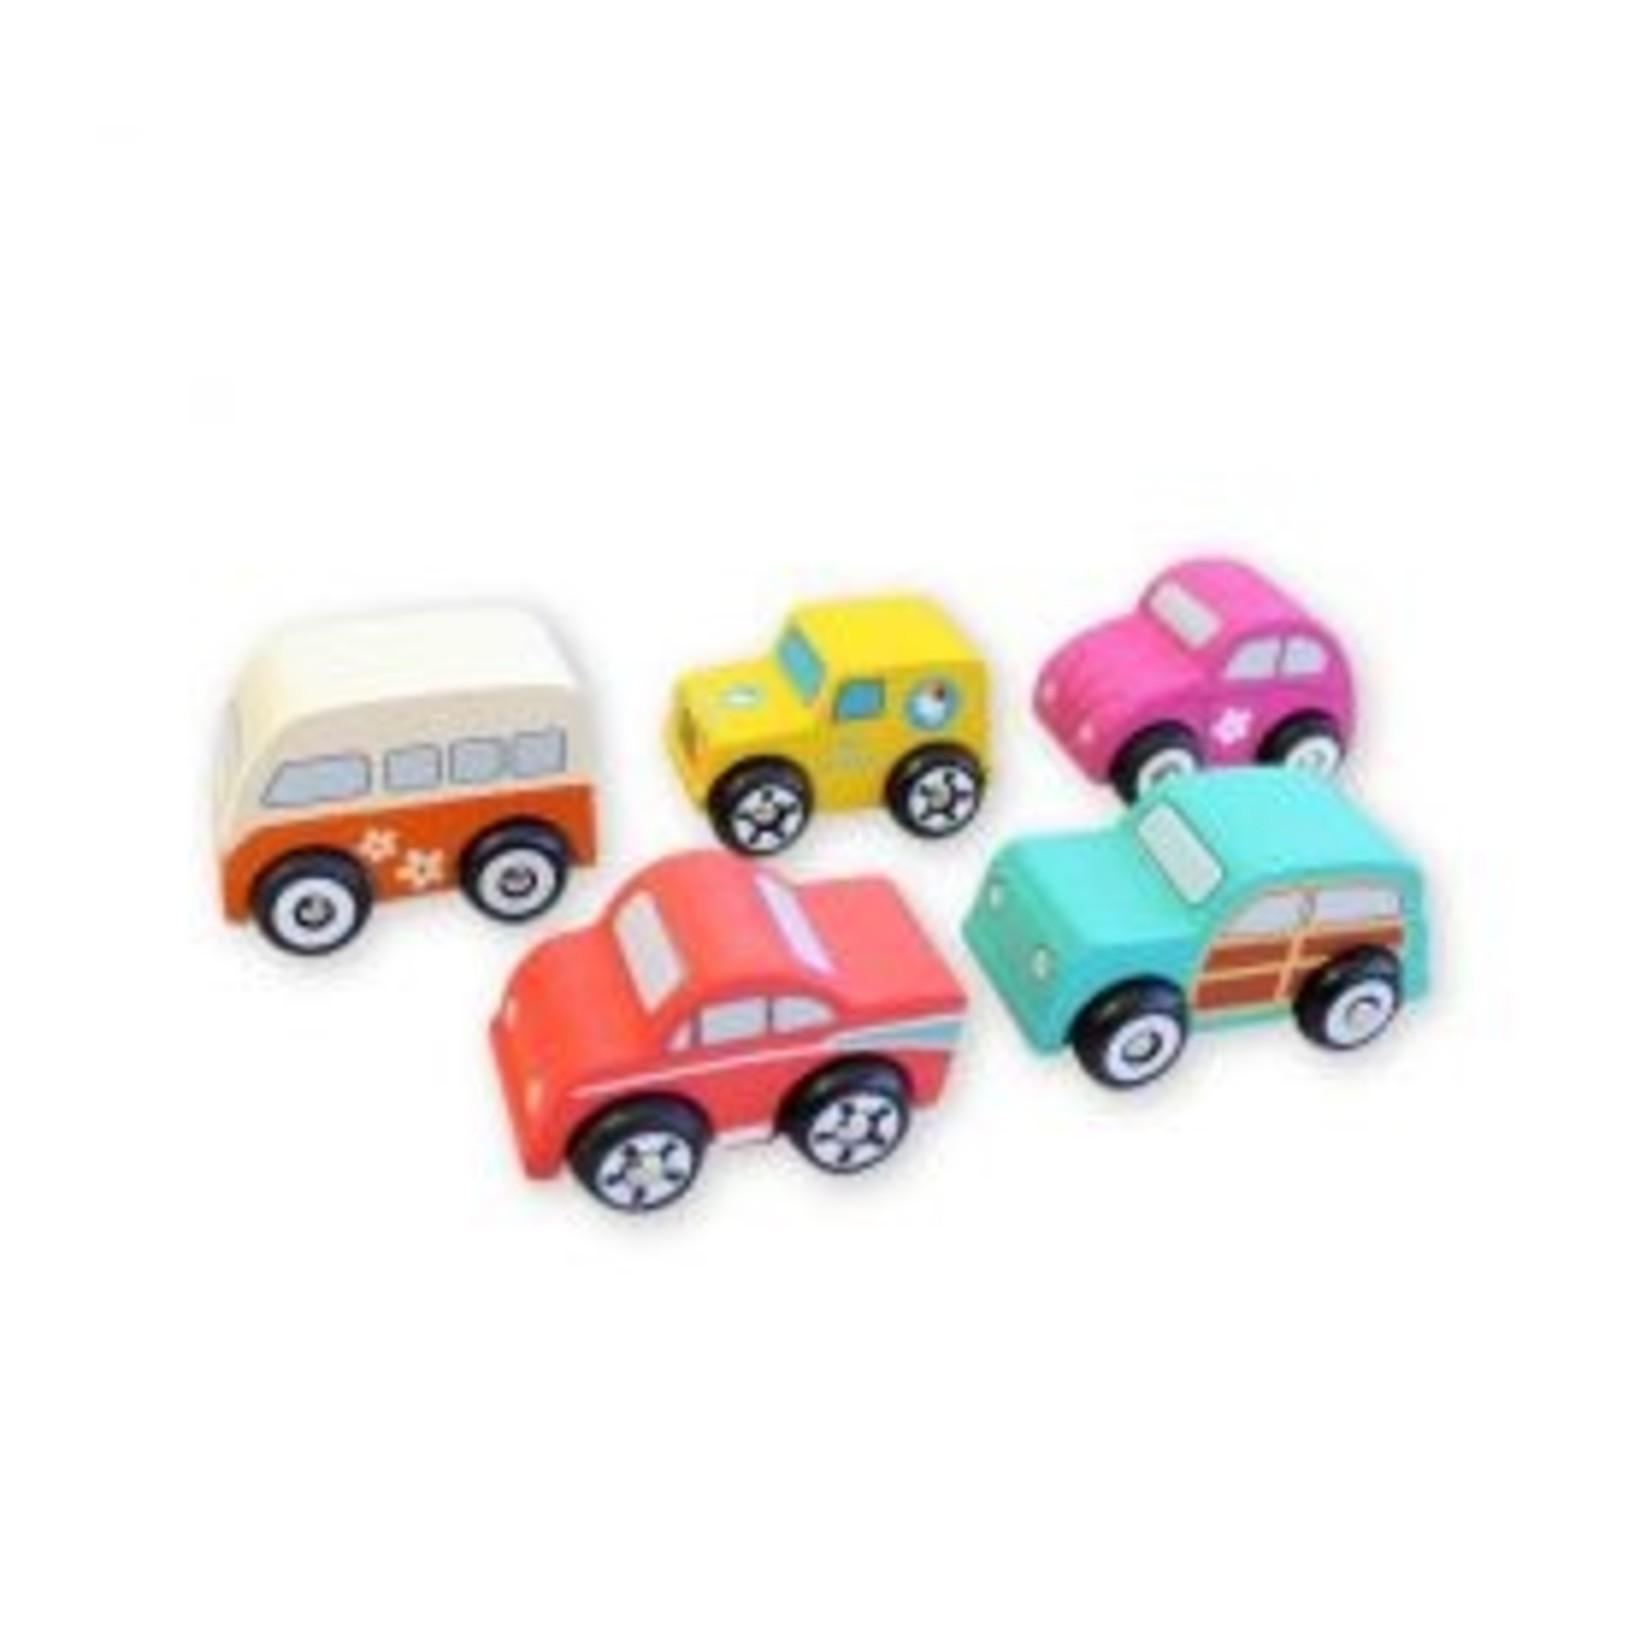 Baby Brands Discoveroo Beach Car Set (5 Cars)